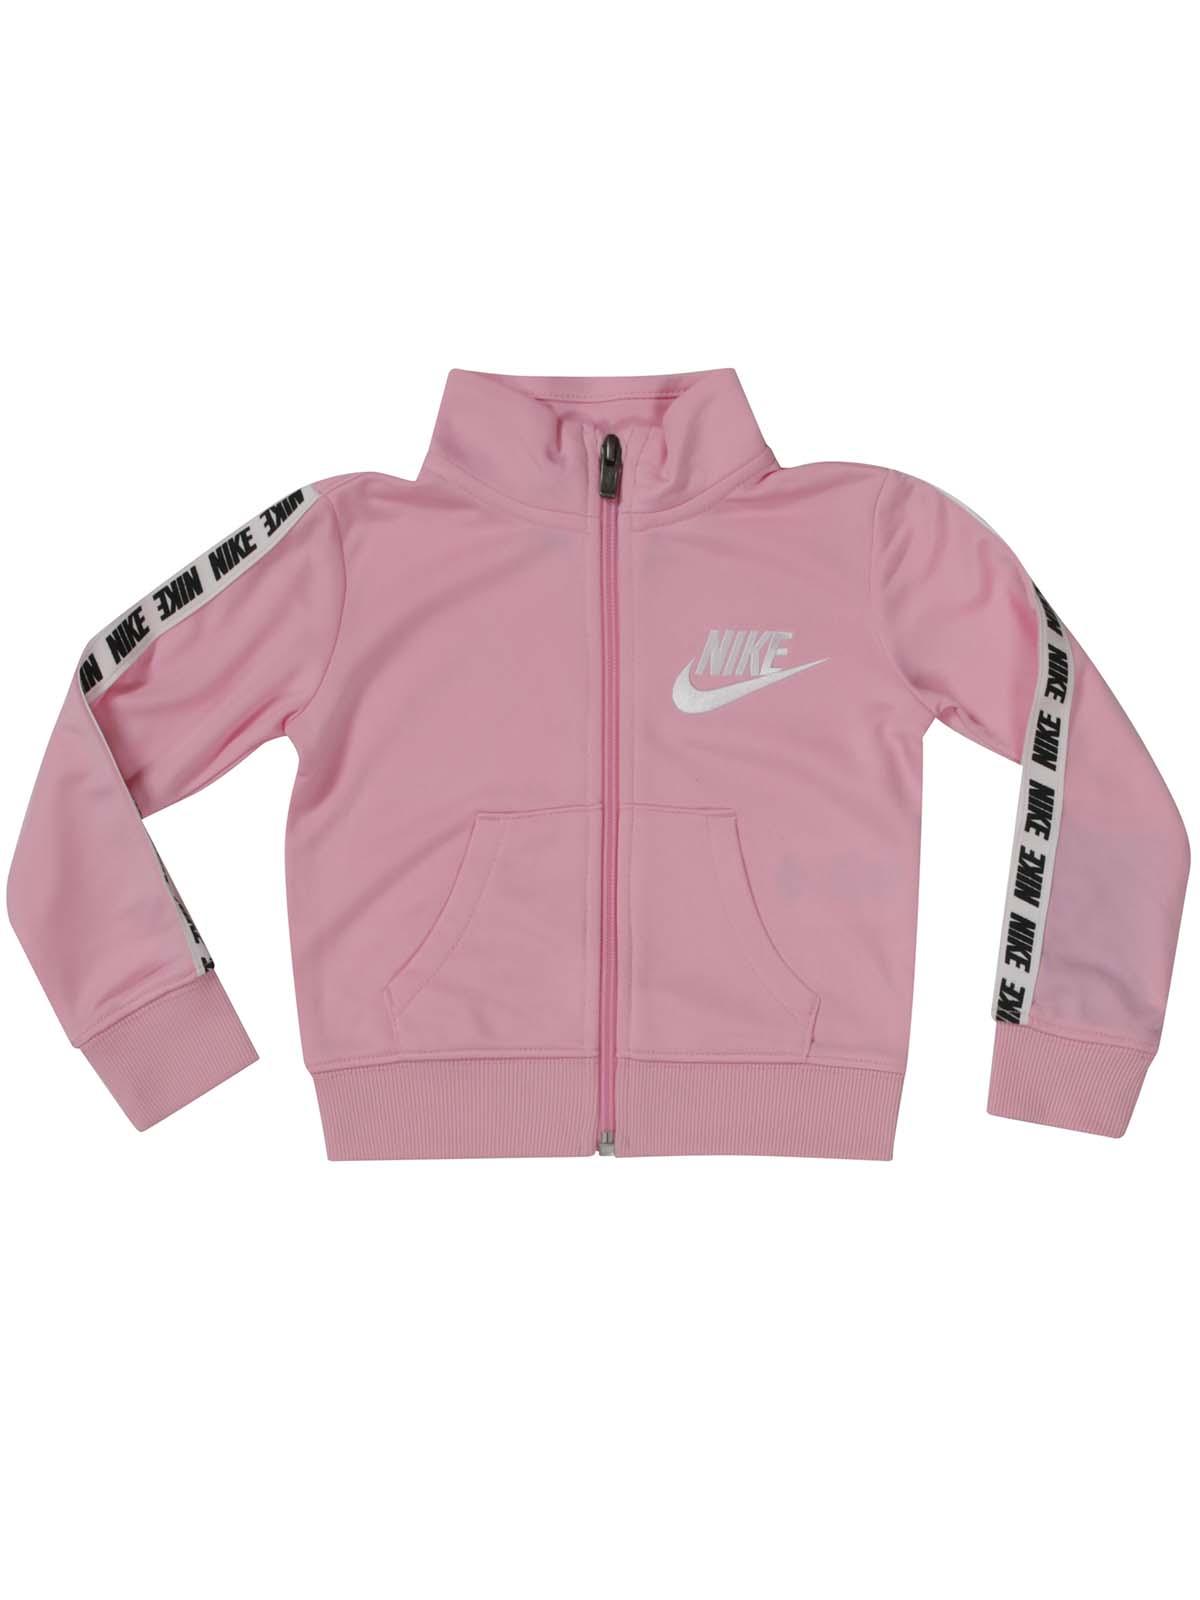 Nike ילדים// Nsw Logo Track Suit Set